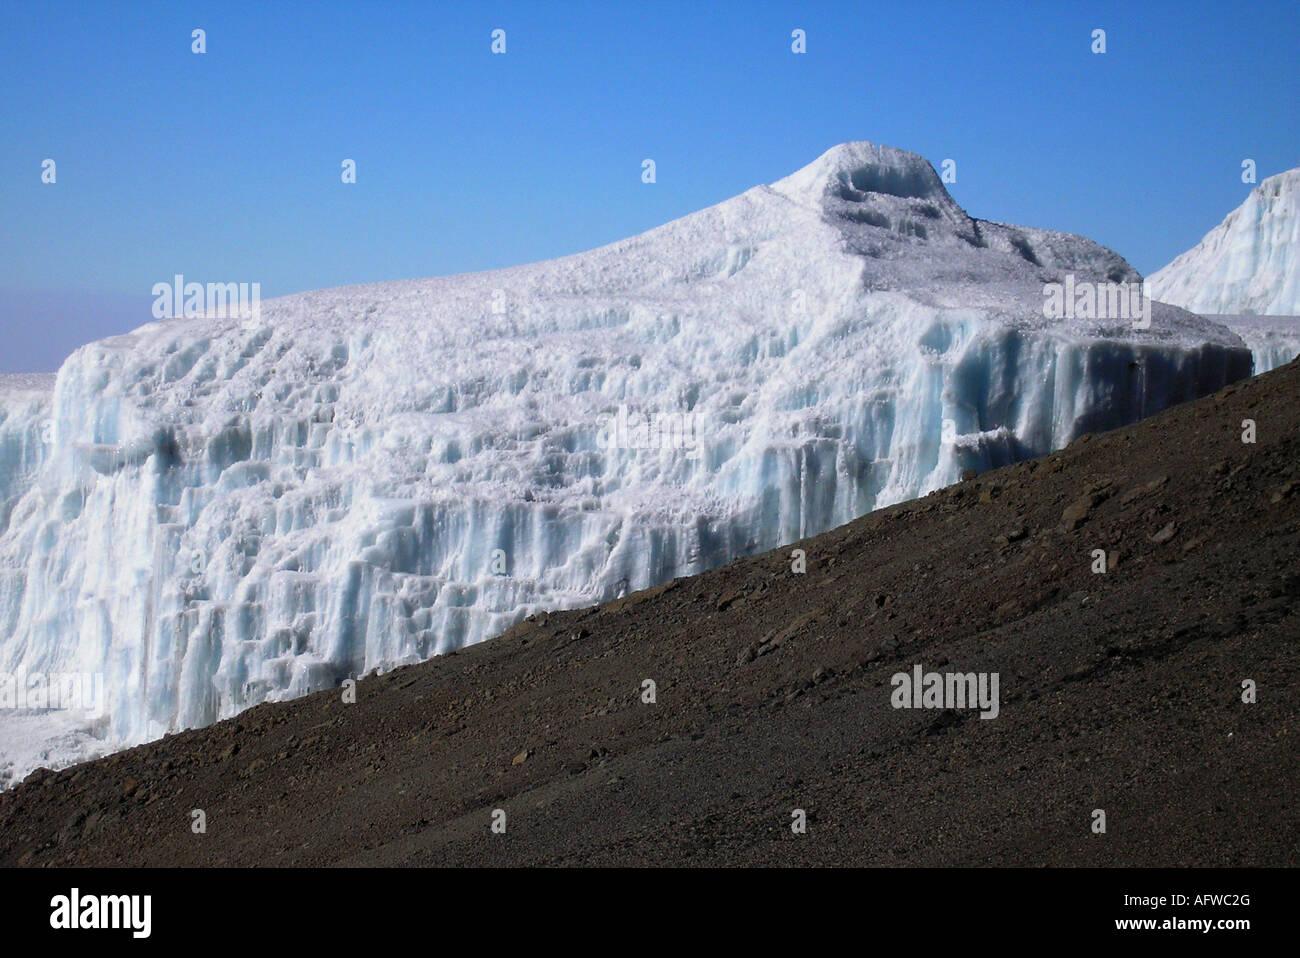 Kilimanjaro, Tanzania, Africa - Stock Image